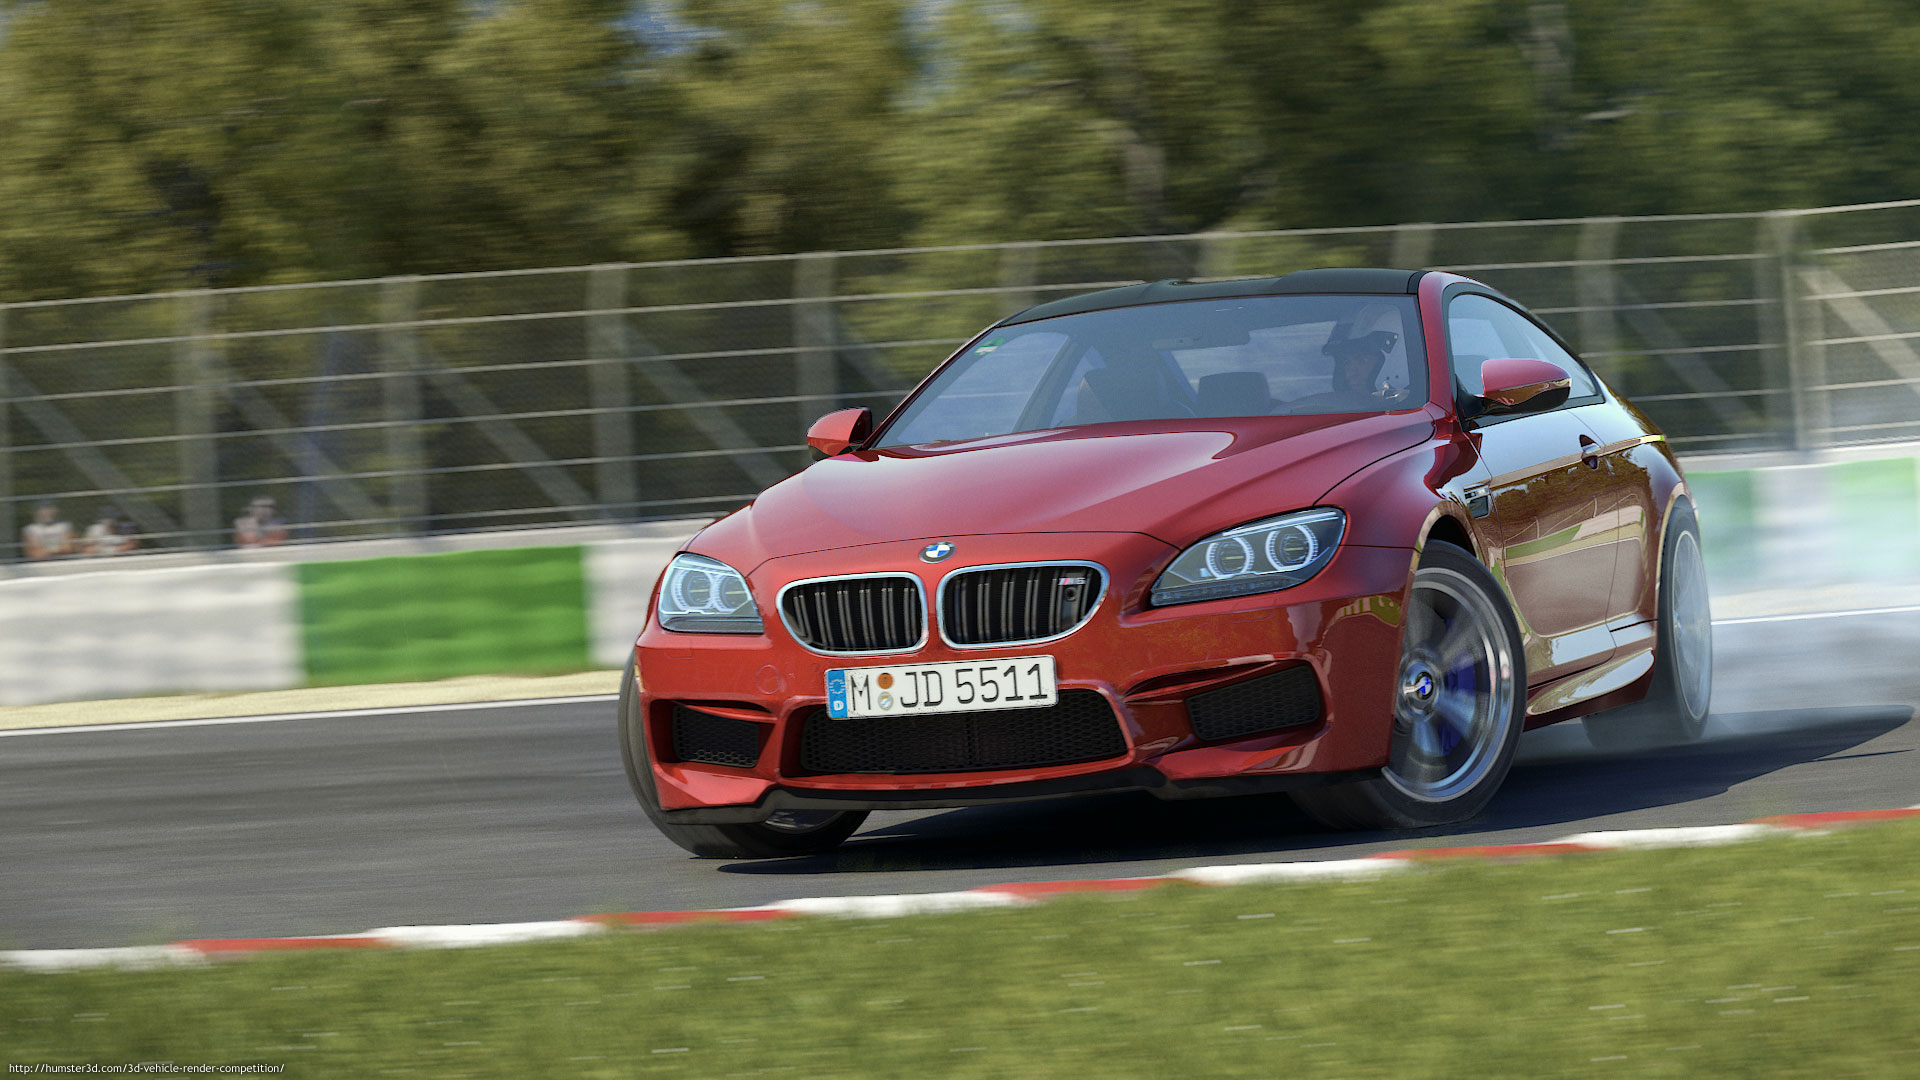 BMW M6 3d art